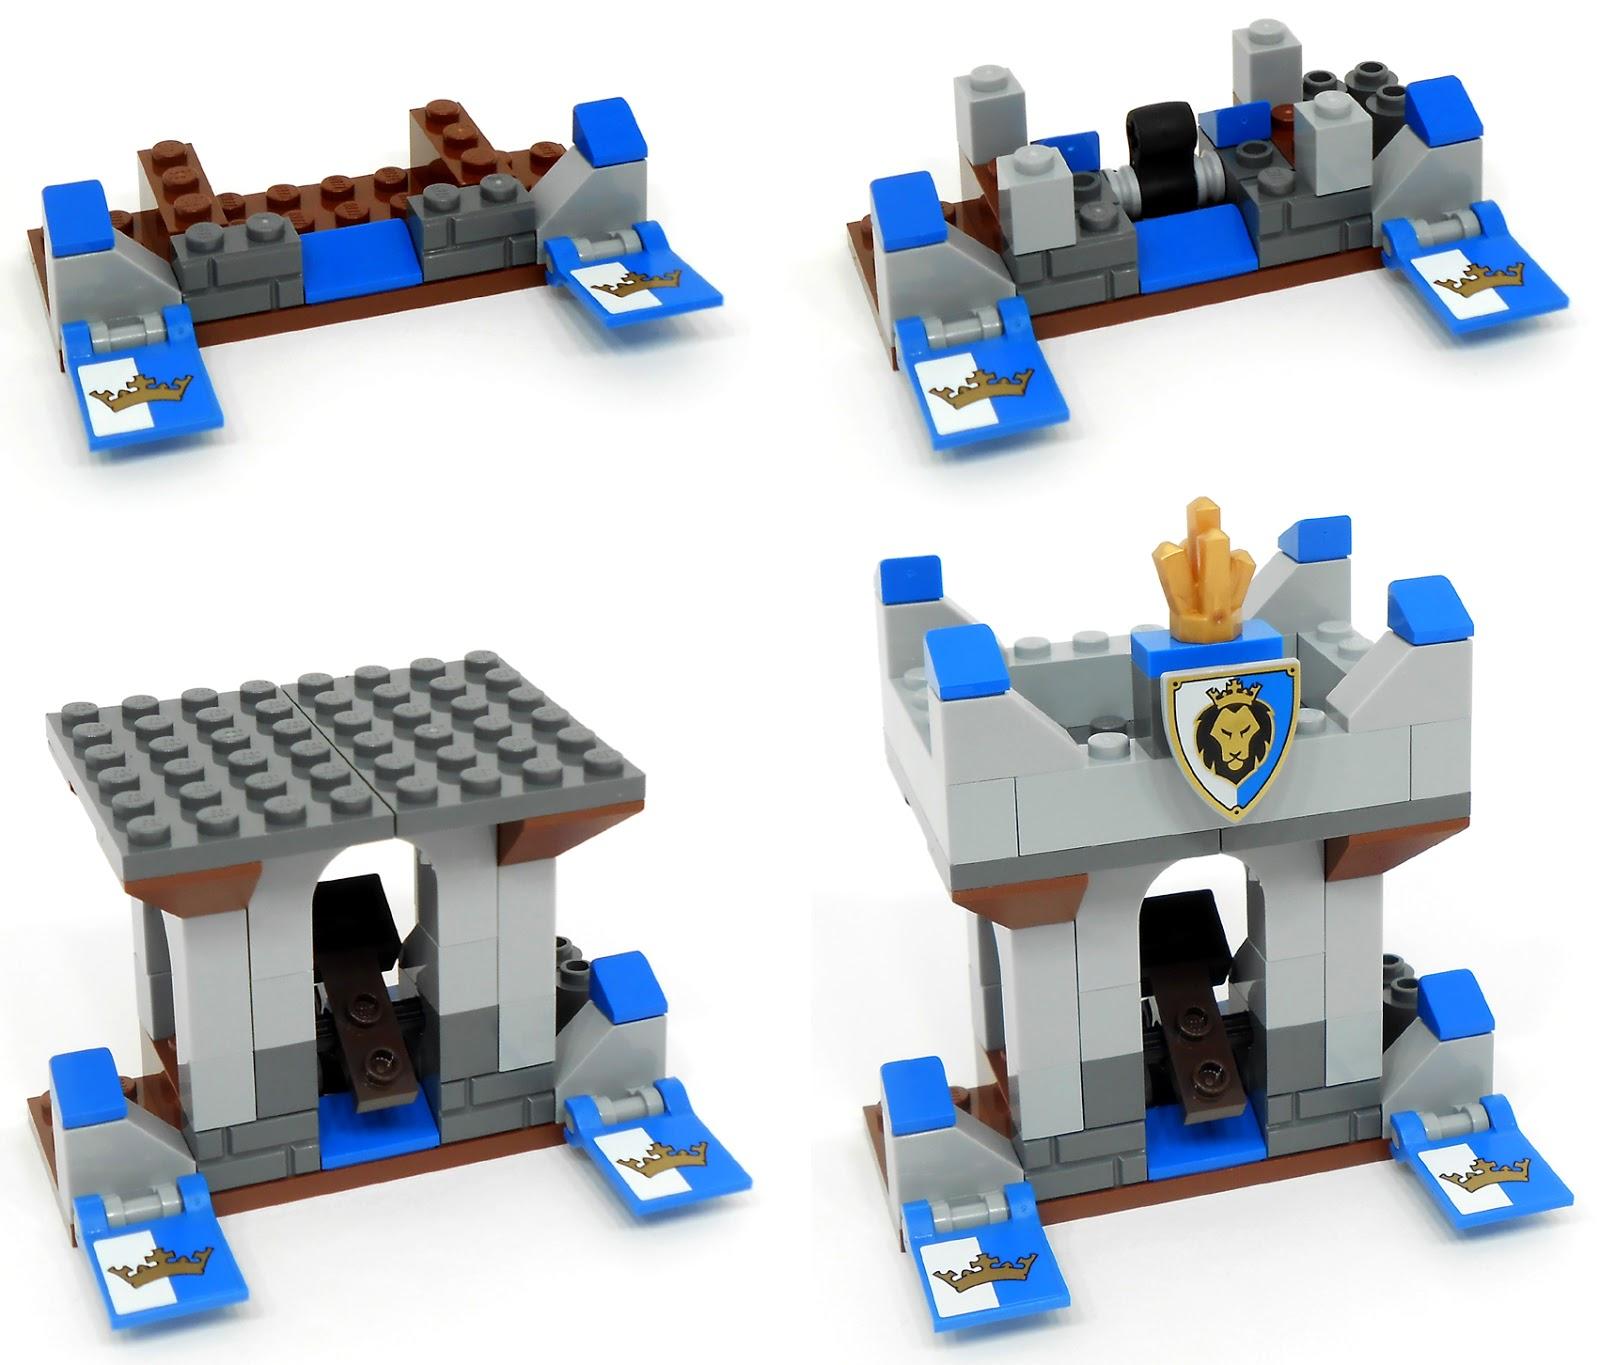 Lego Spares Parts Sticker Set For 70402 Lego Complete Sets Packs